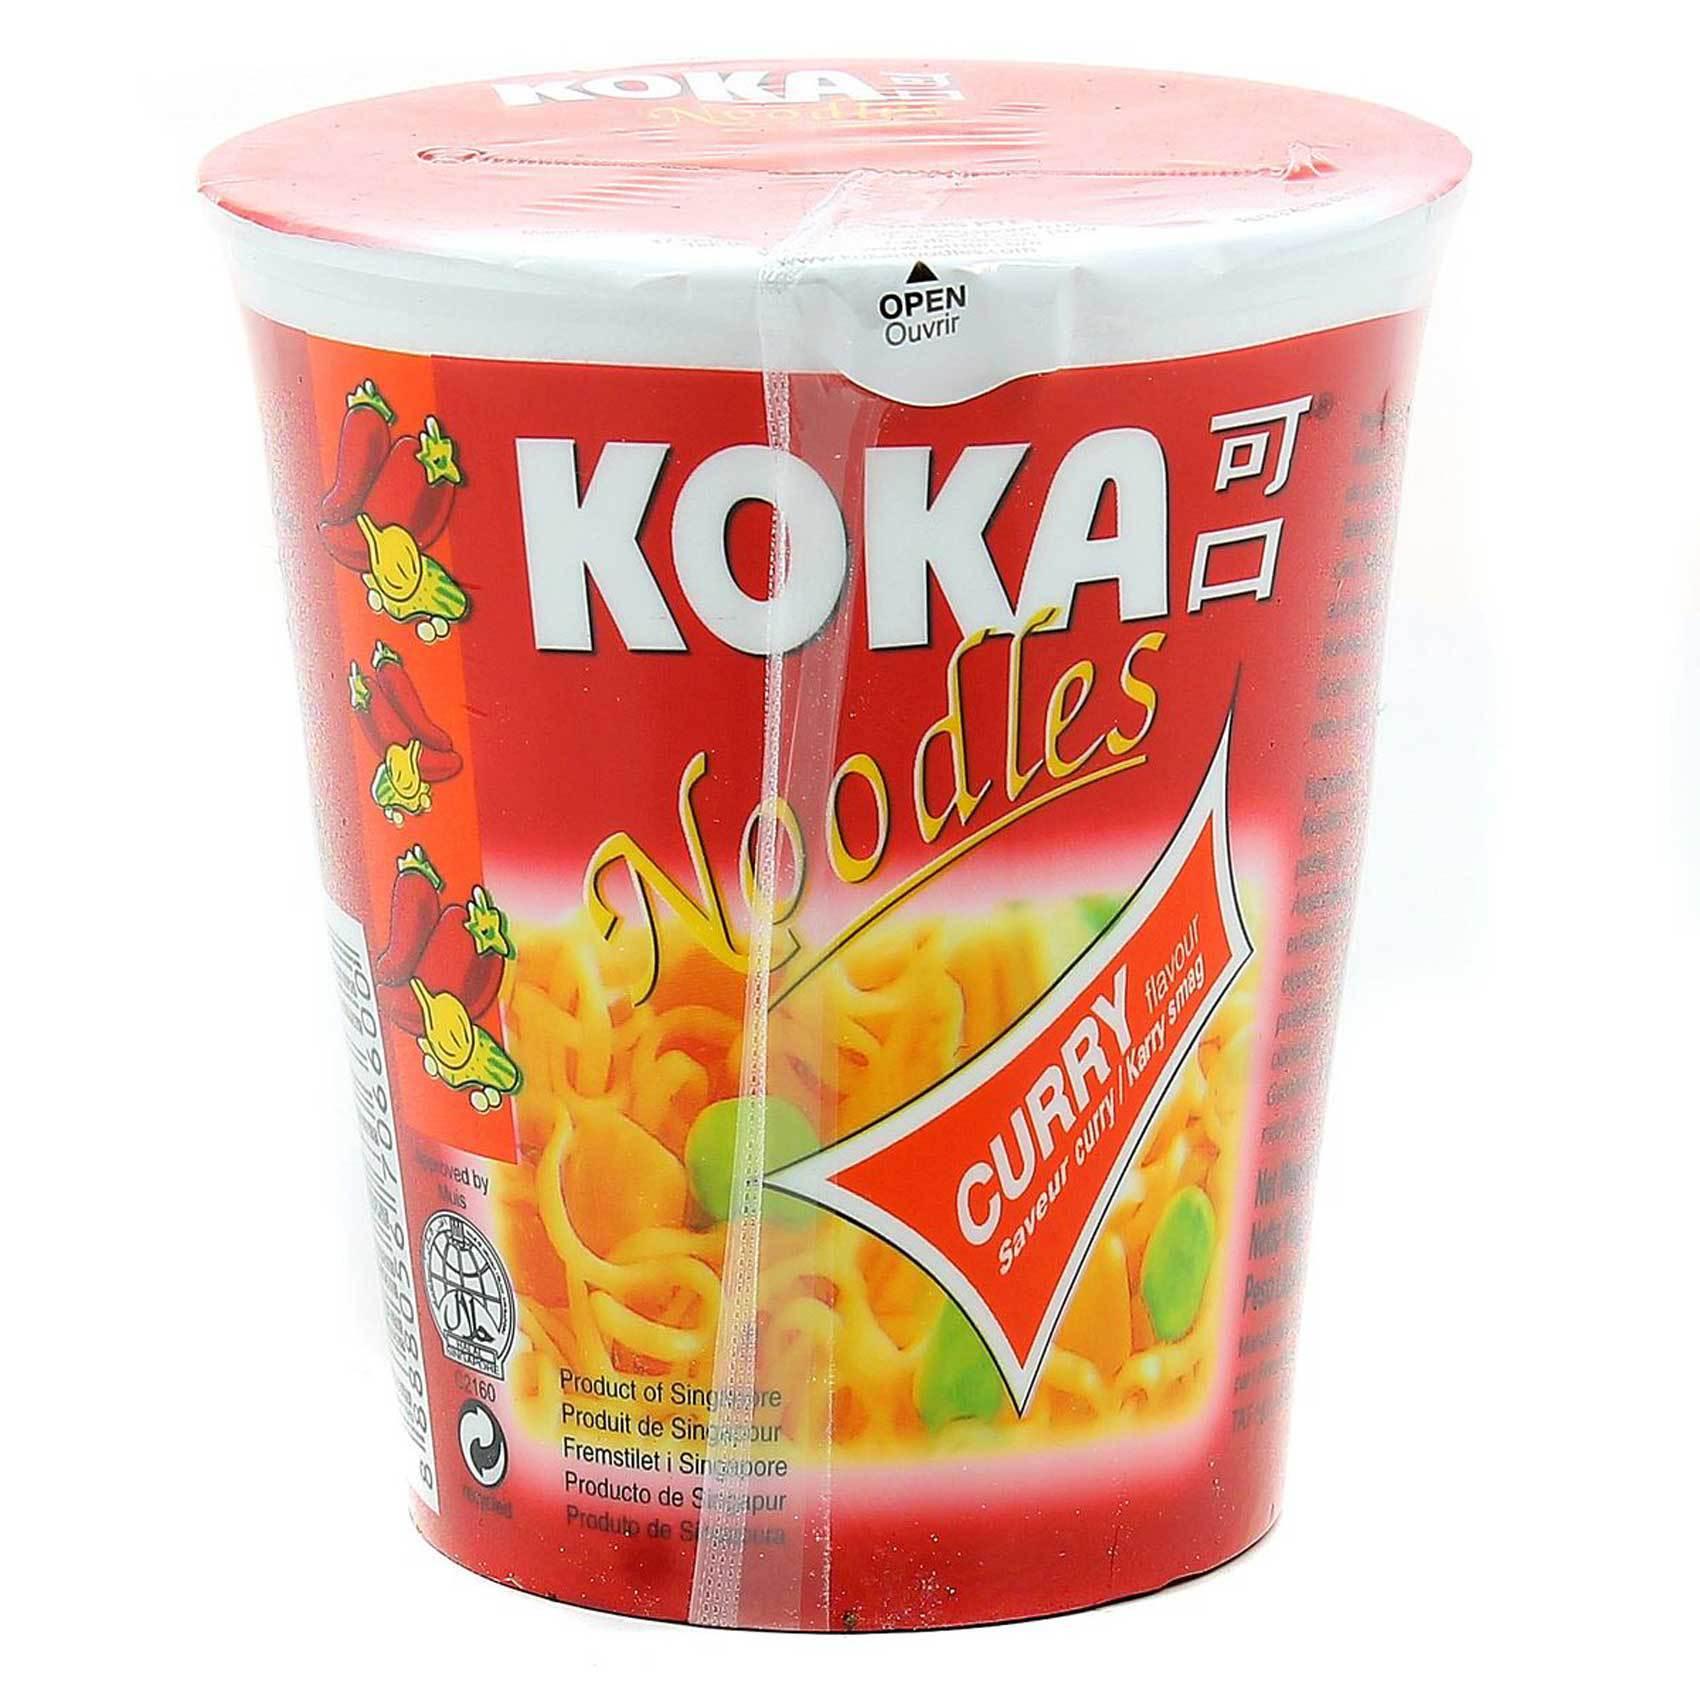 KOKA CUP NOODLES CURRY 70GR